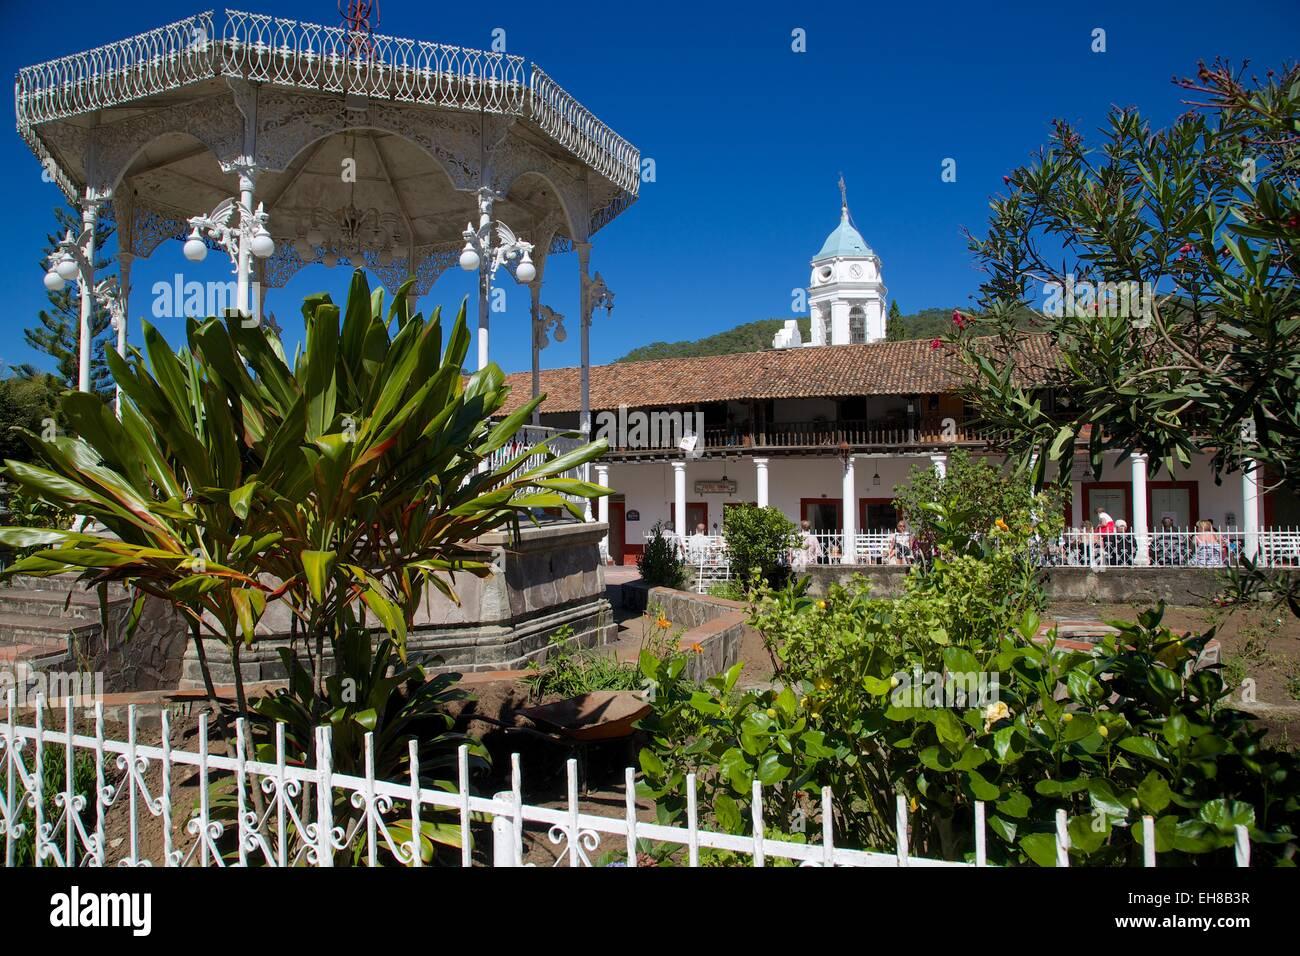 Bandstand and Church Belltower, San Sebastian del Oeste (San Sebastian), Jalisco, Mexico, North America - Stock Image